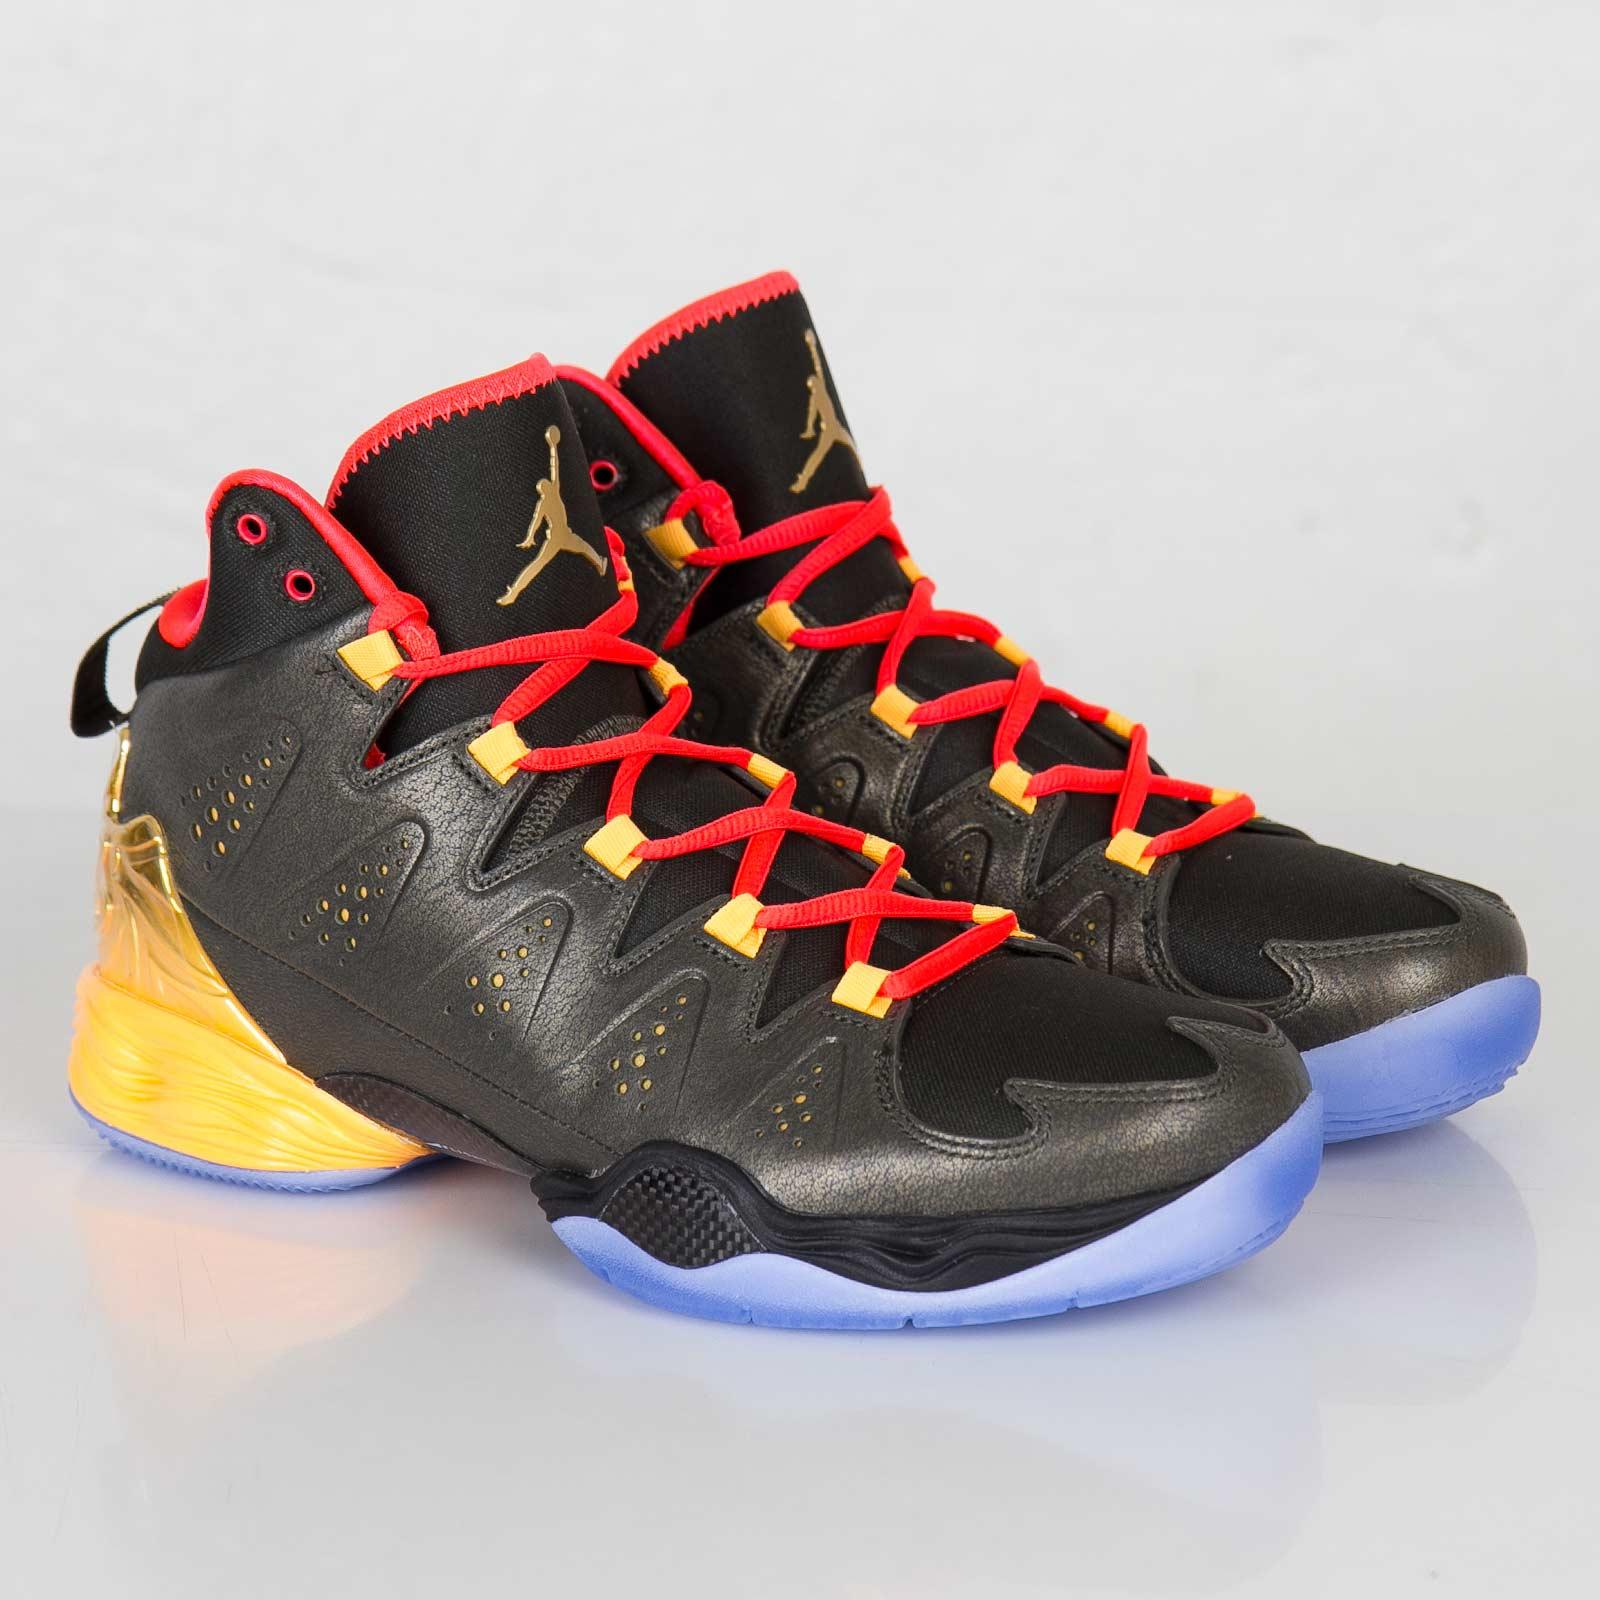 Jordan Brand Jordan Melo M10 All Star - 656325-323 - Sneakersnstuff ... 073cd9639b73